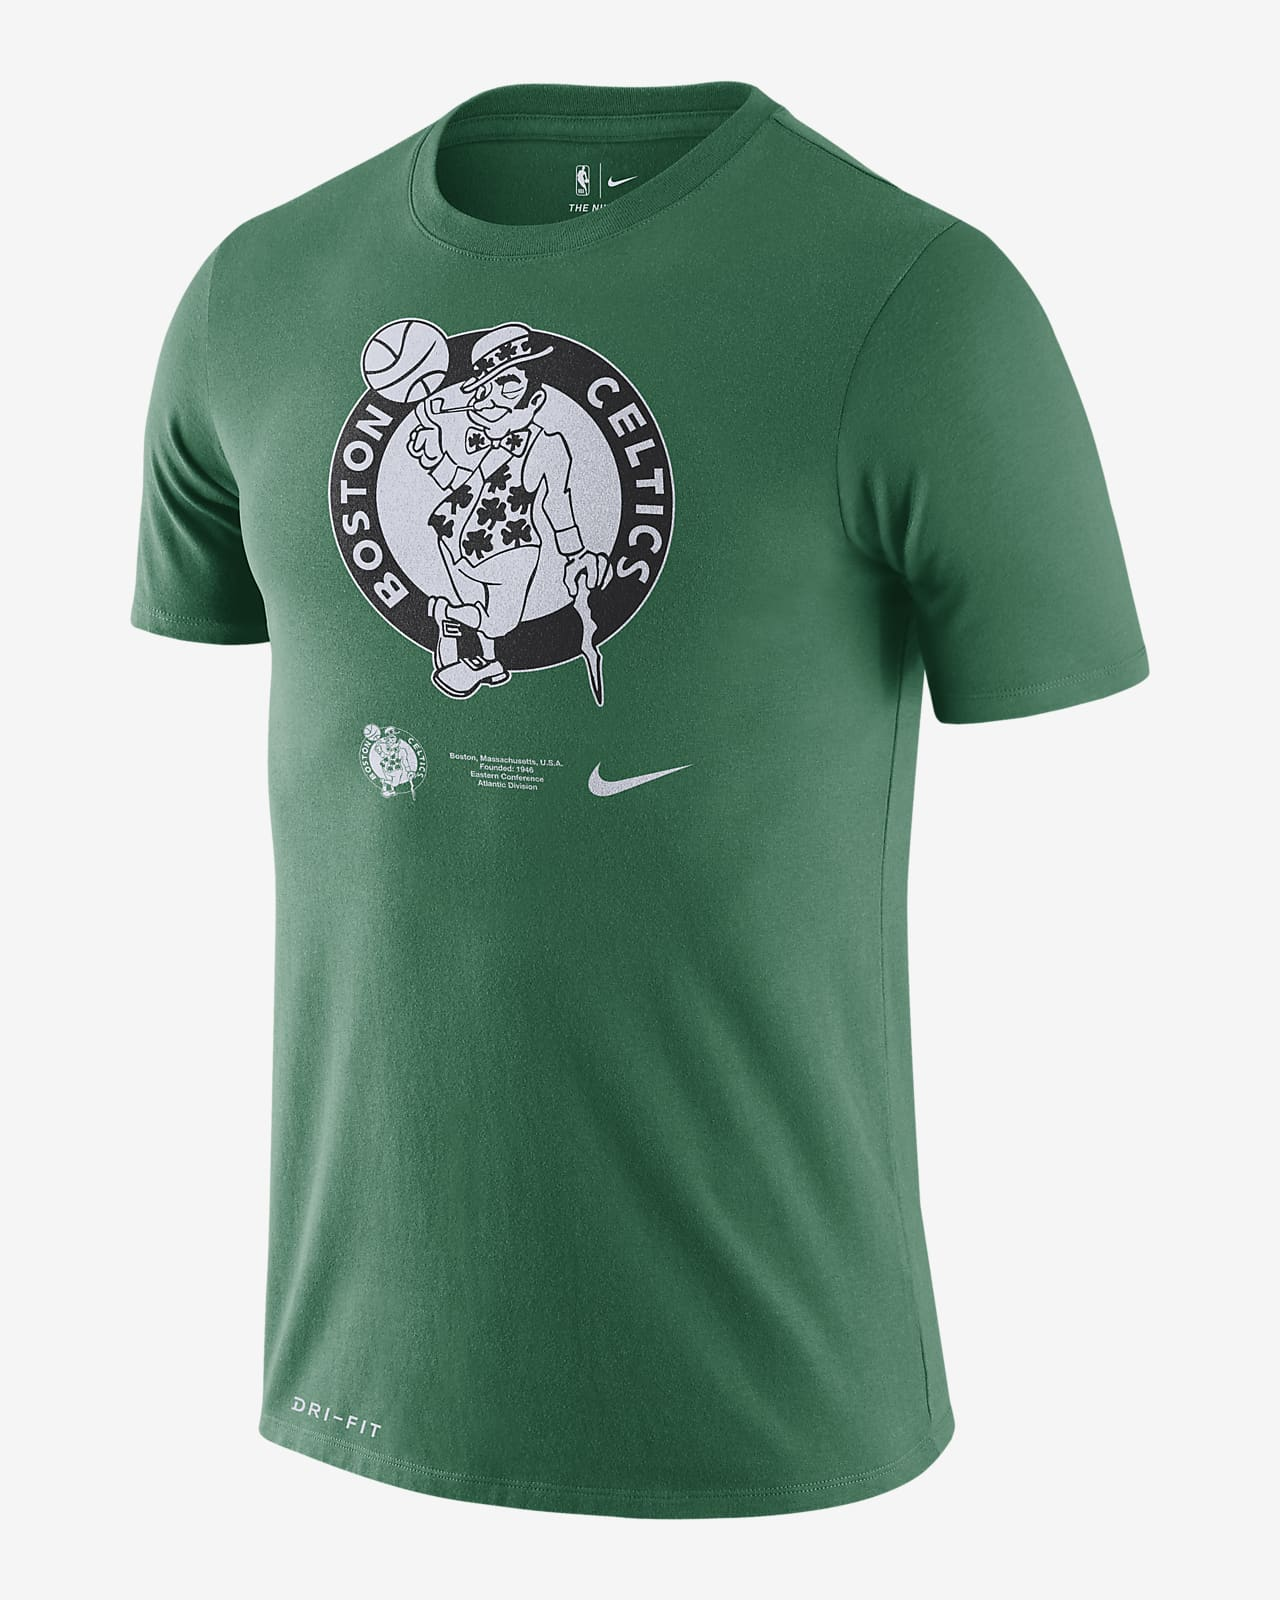 Celtics Logo Nike Dri-FIT NBA-T-Shirt für Herren